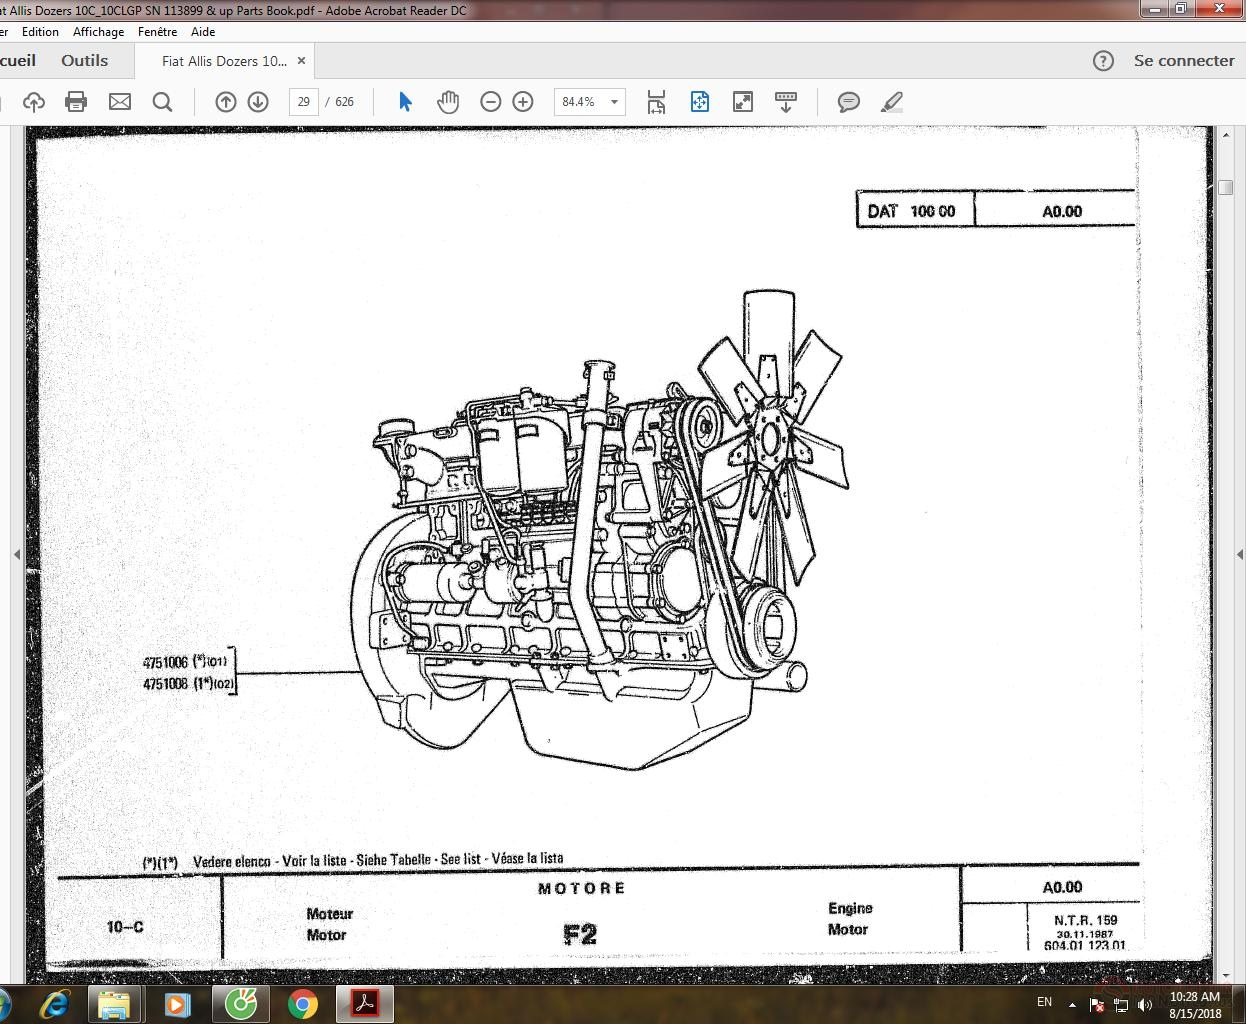 Fiat Allis Dozers 10C_10CLGP SN 113899 & up Parts Book